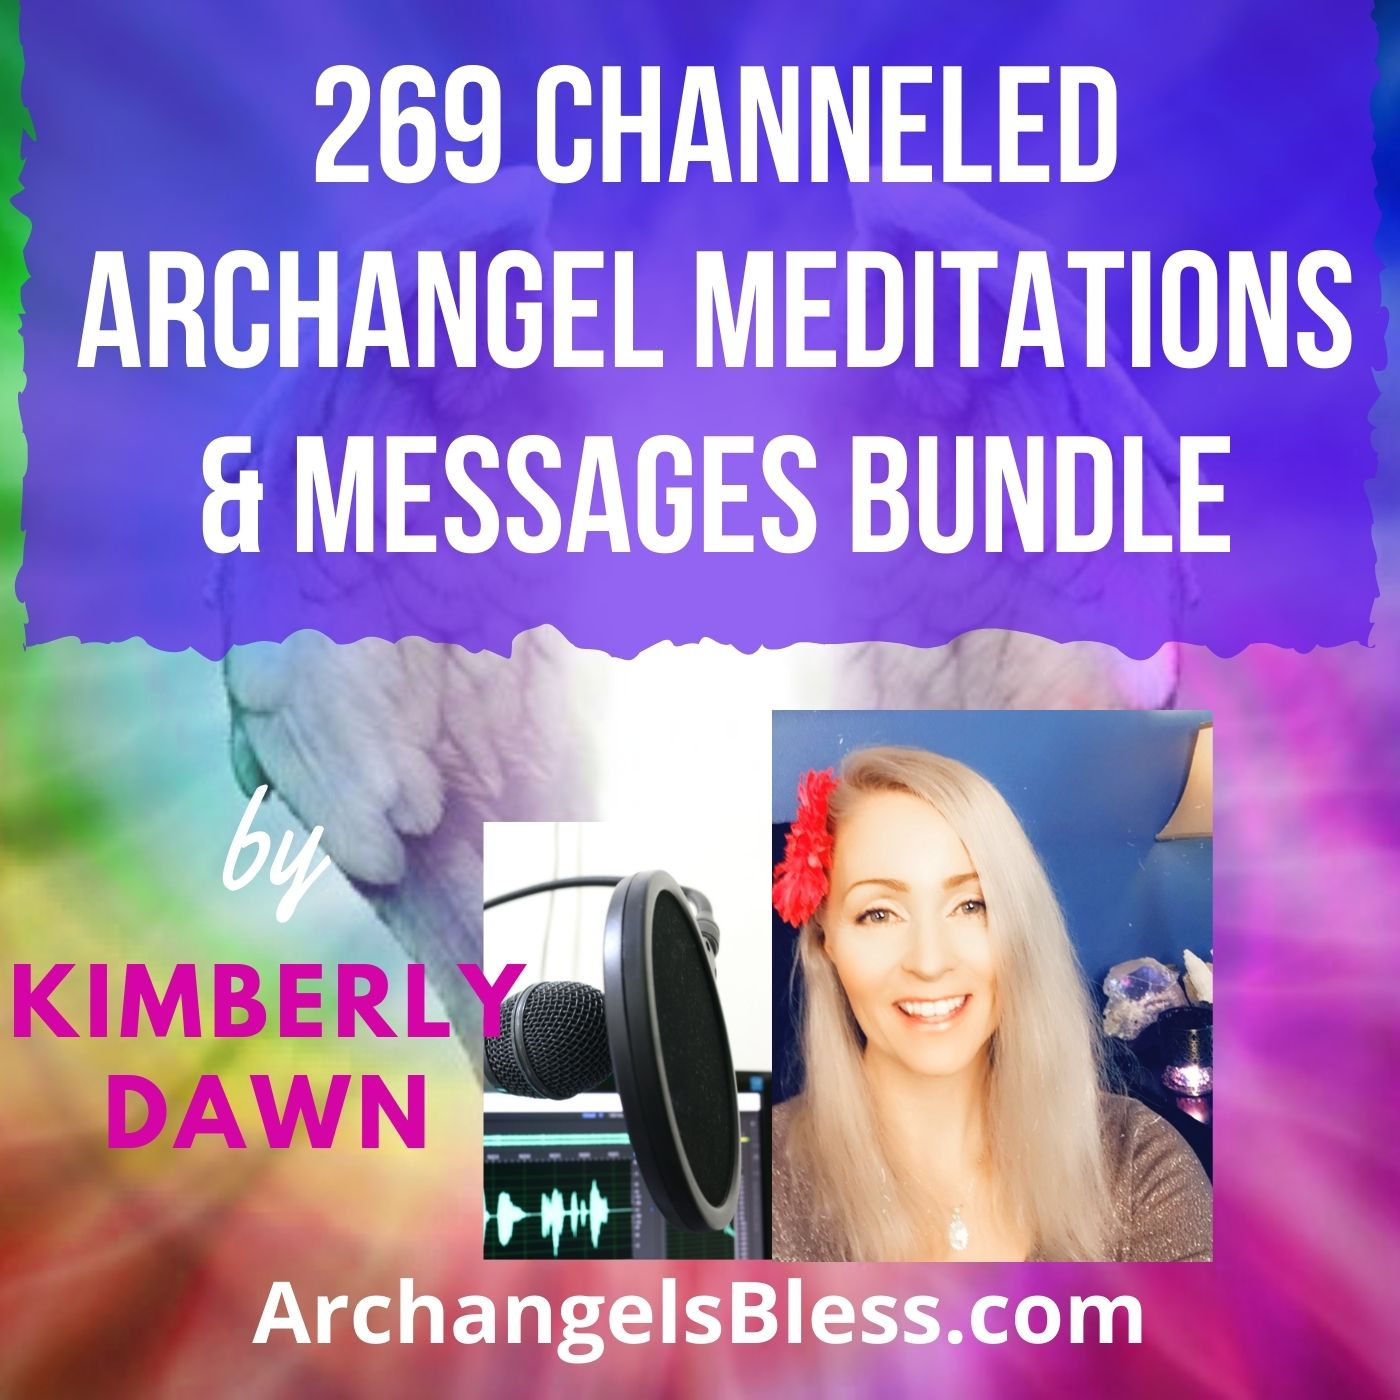 269 Channeled Archangel Meditations 10-20 Minutes Each [VIP AUDIO BUNDLE]